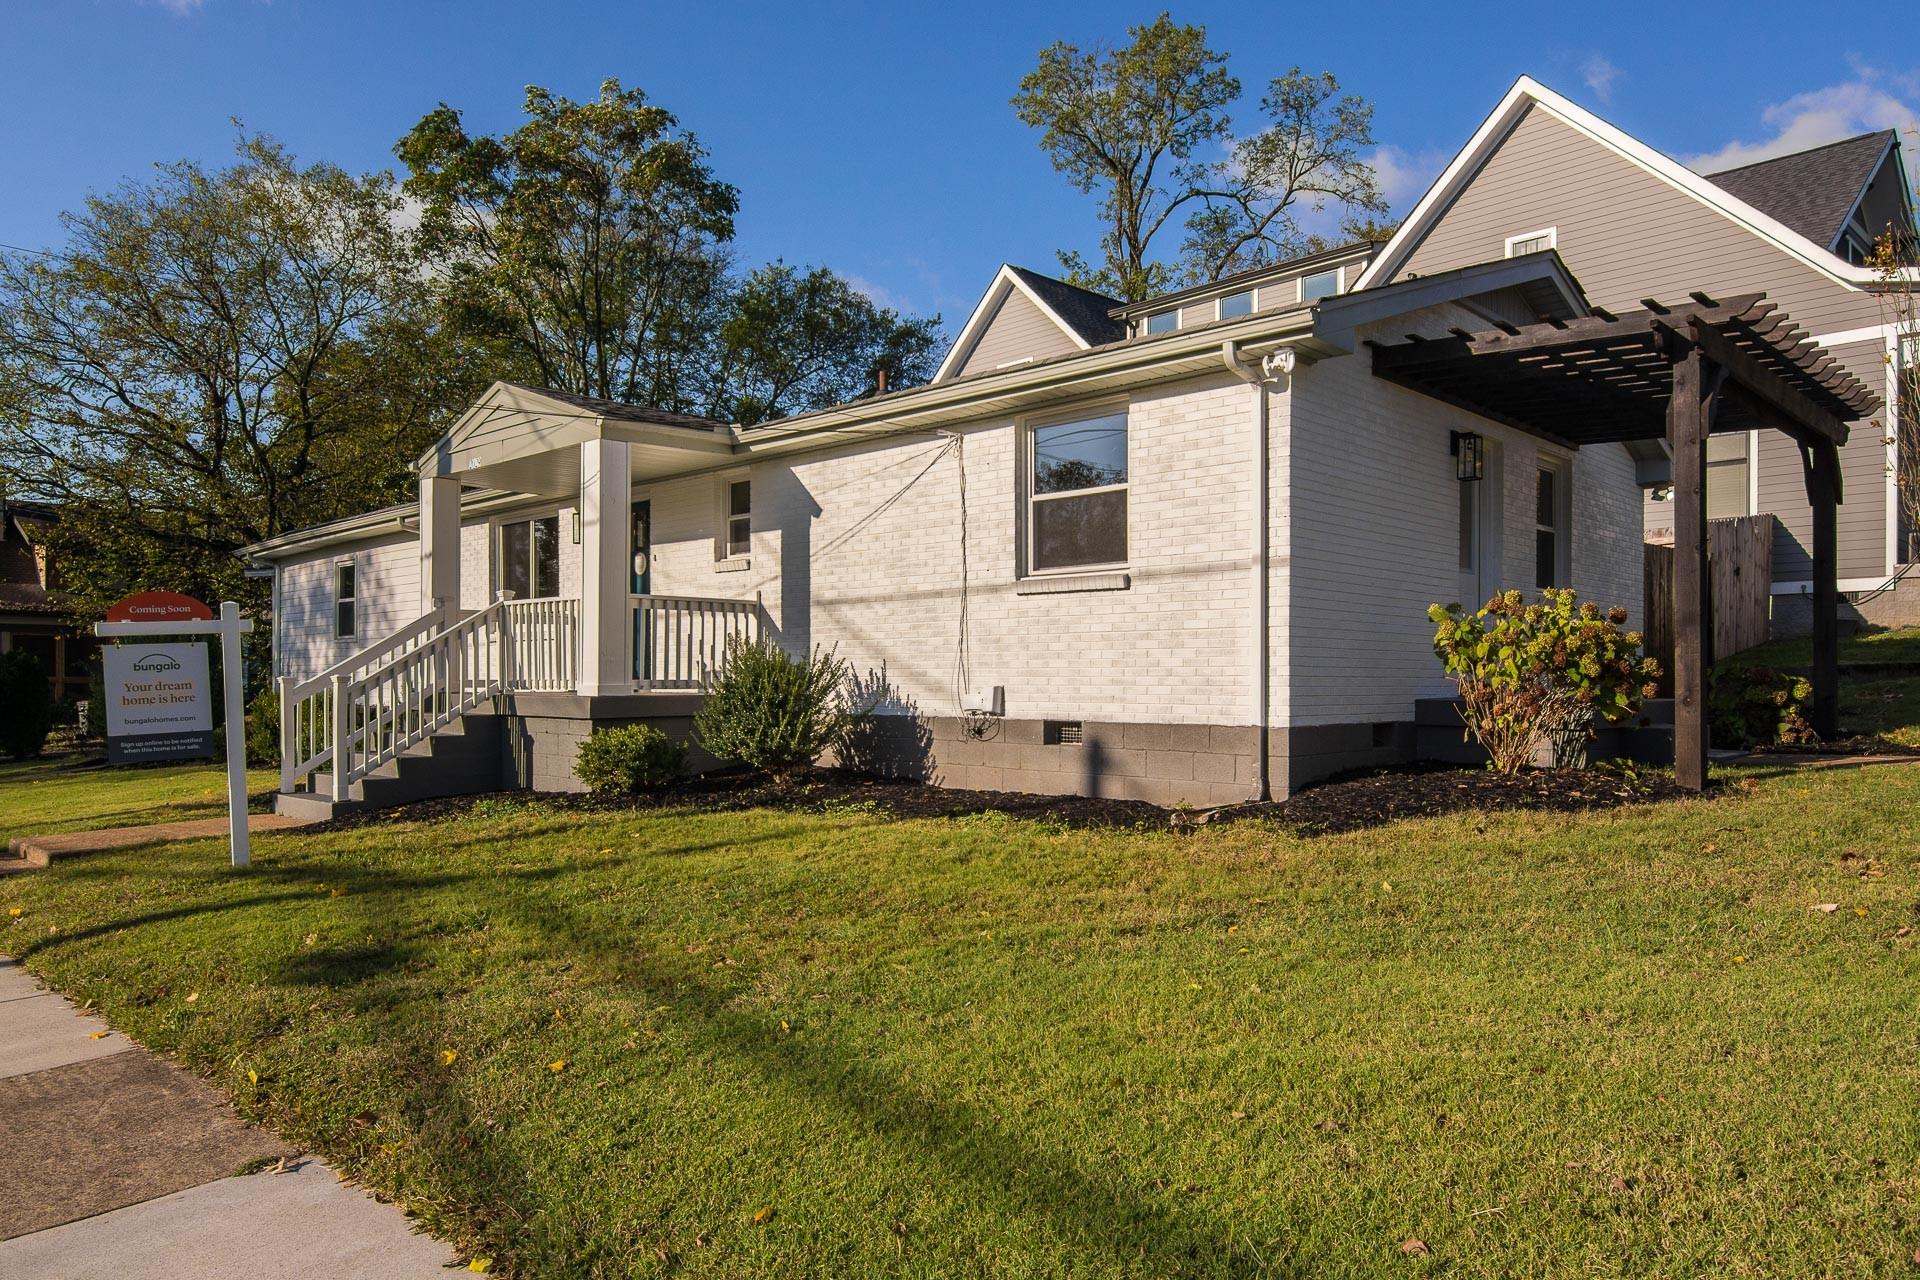 2029 10th Ave, S, Nashville, TN 37204 - Nashville, TN real estate listing